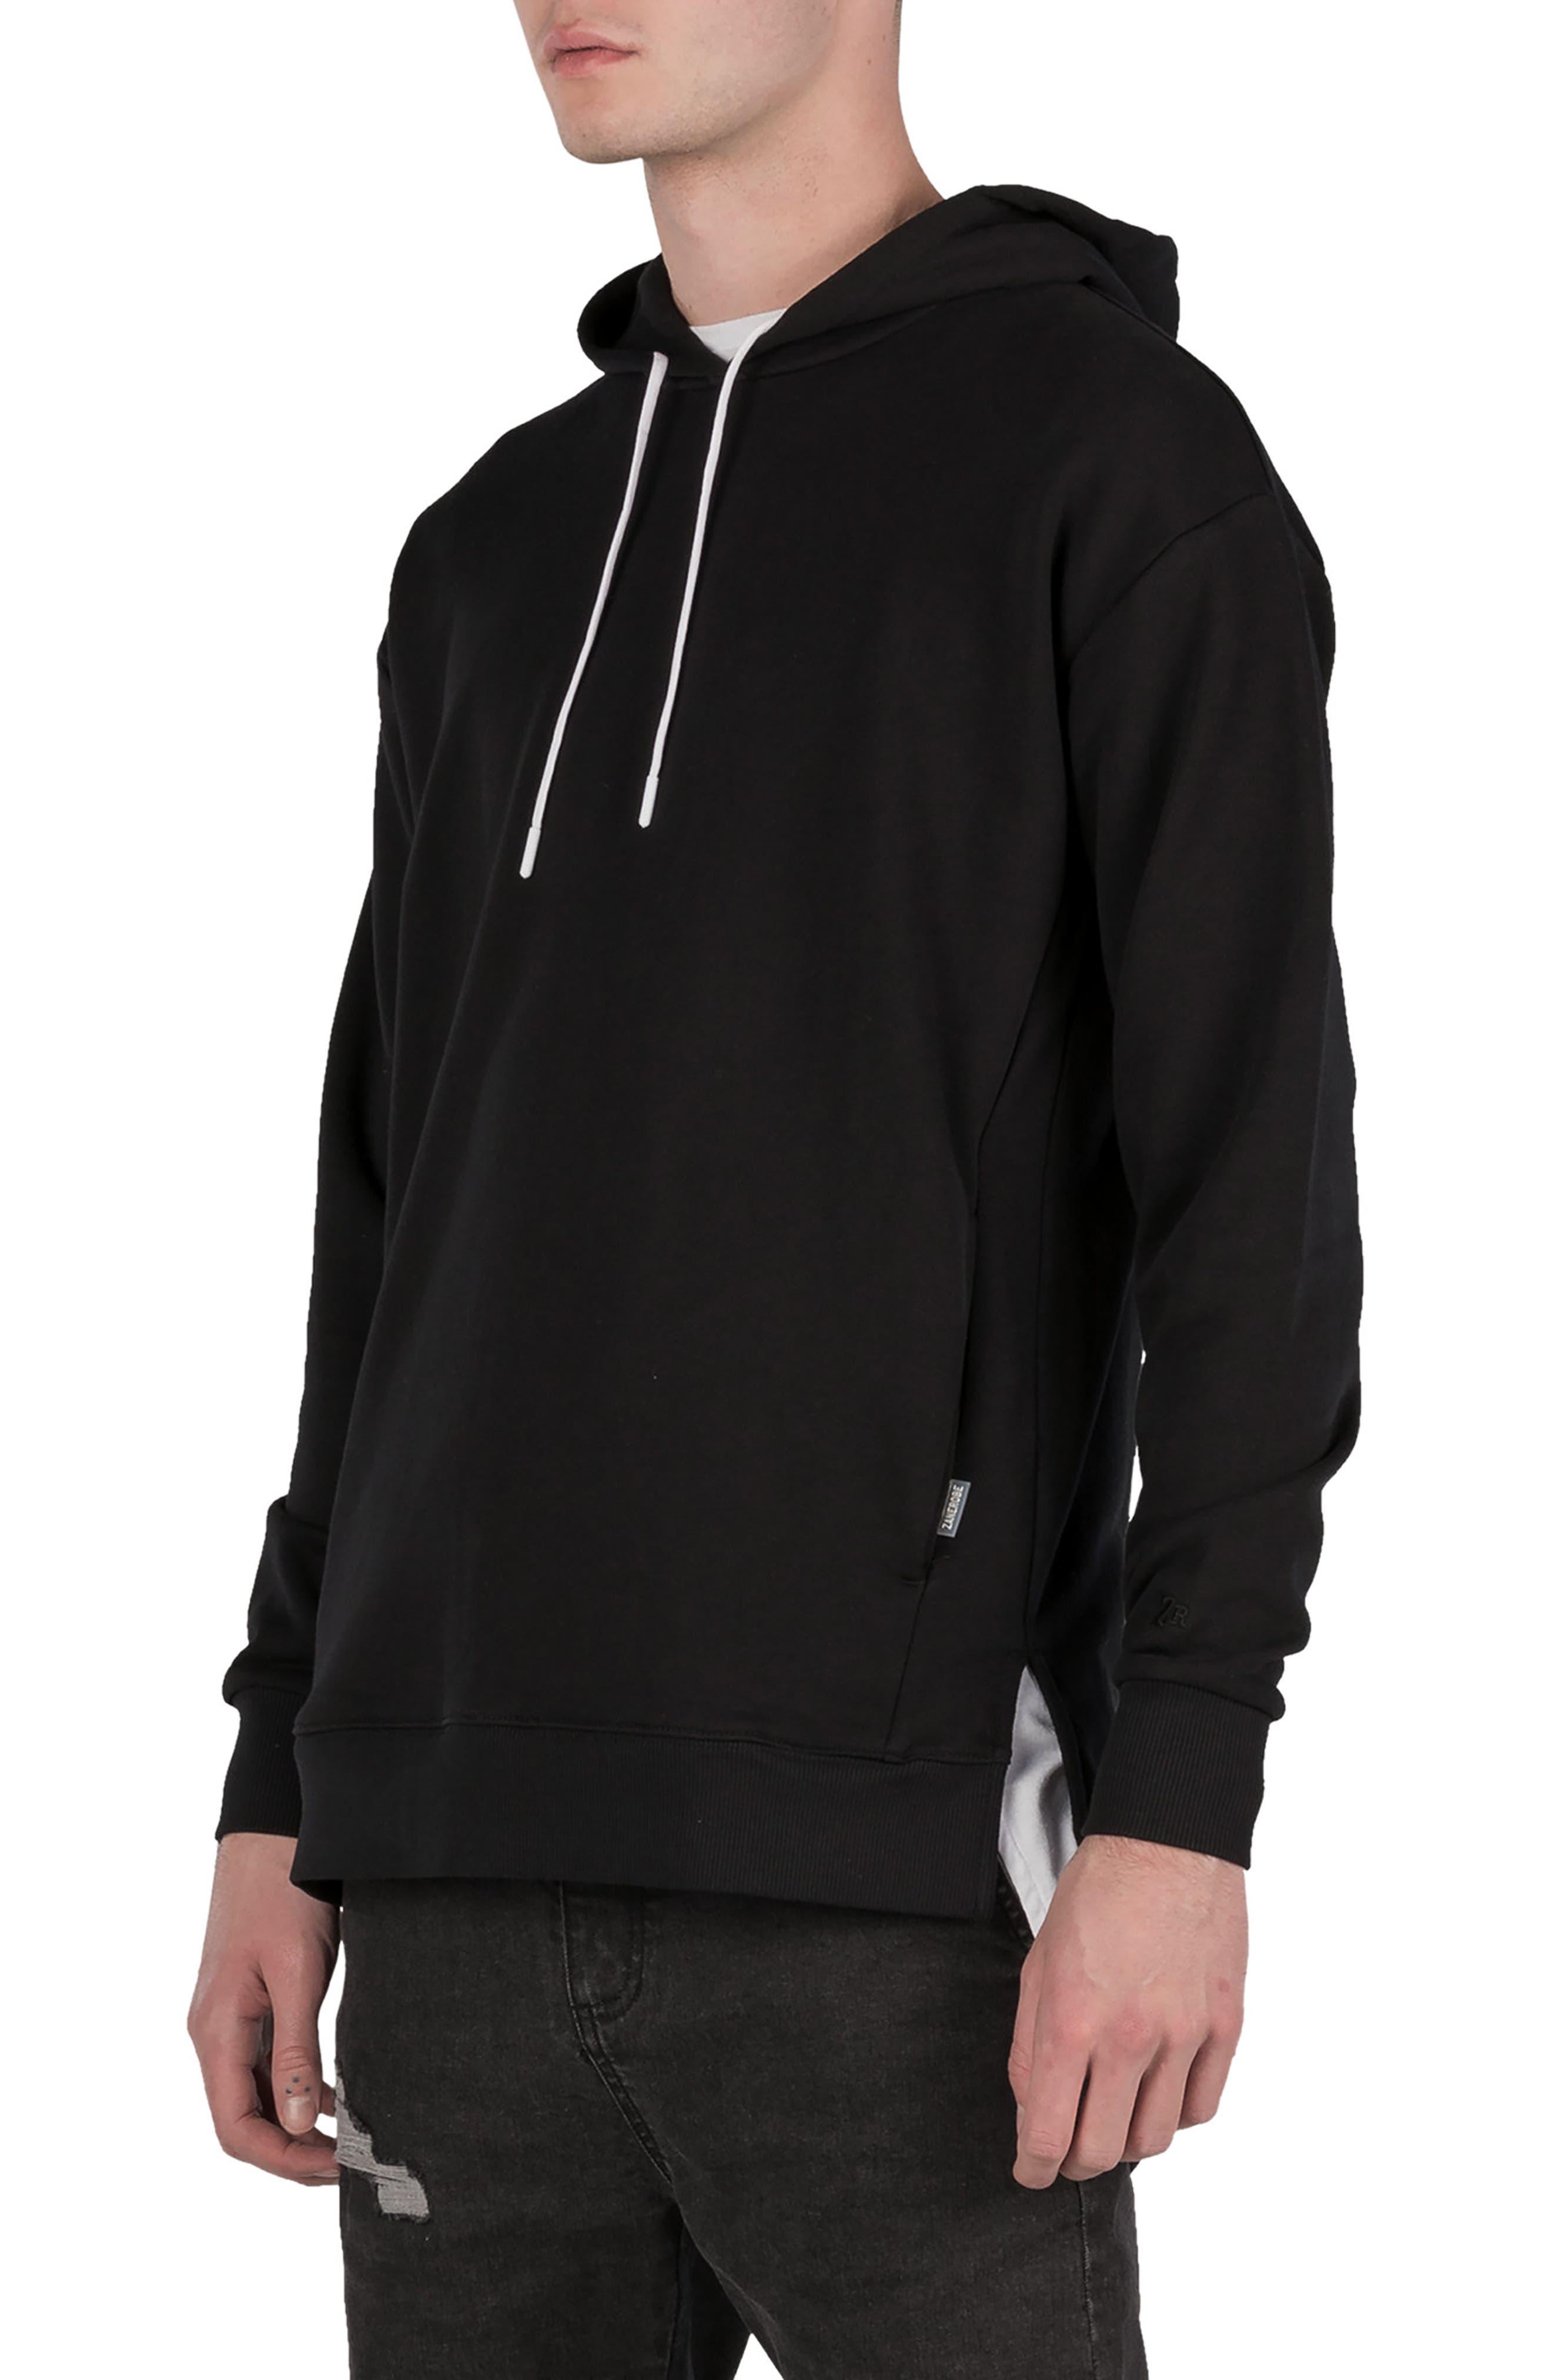 Rugger Hooded Sweatshirt,                             Alternate thumbnail 5, color,                             BLACK